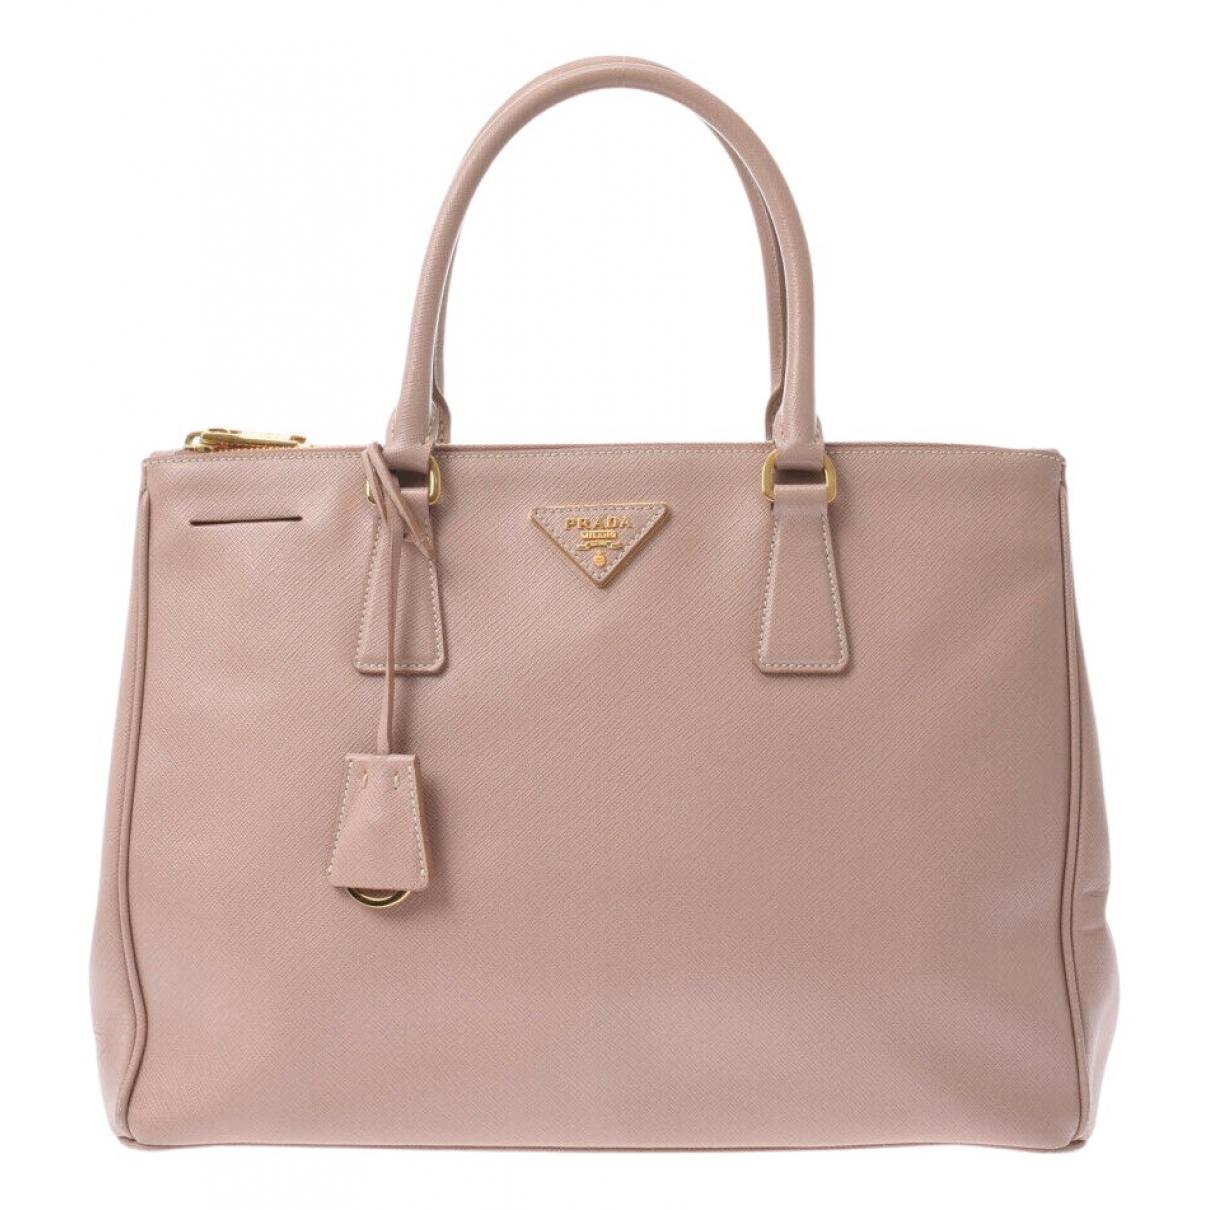 Prada saffiano  Pink Leather handbag for Women N